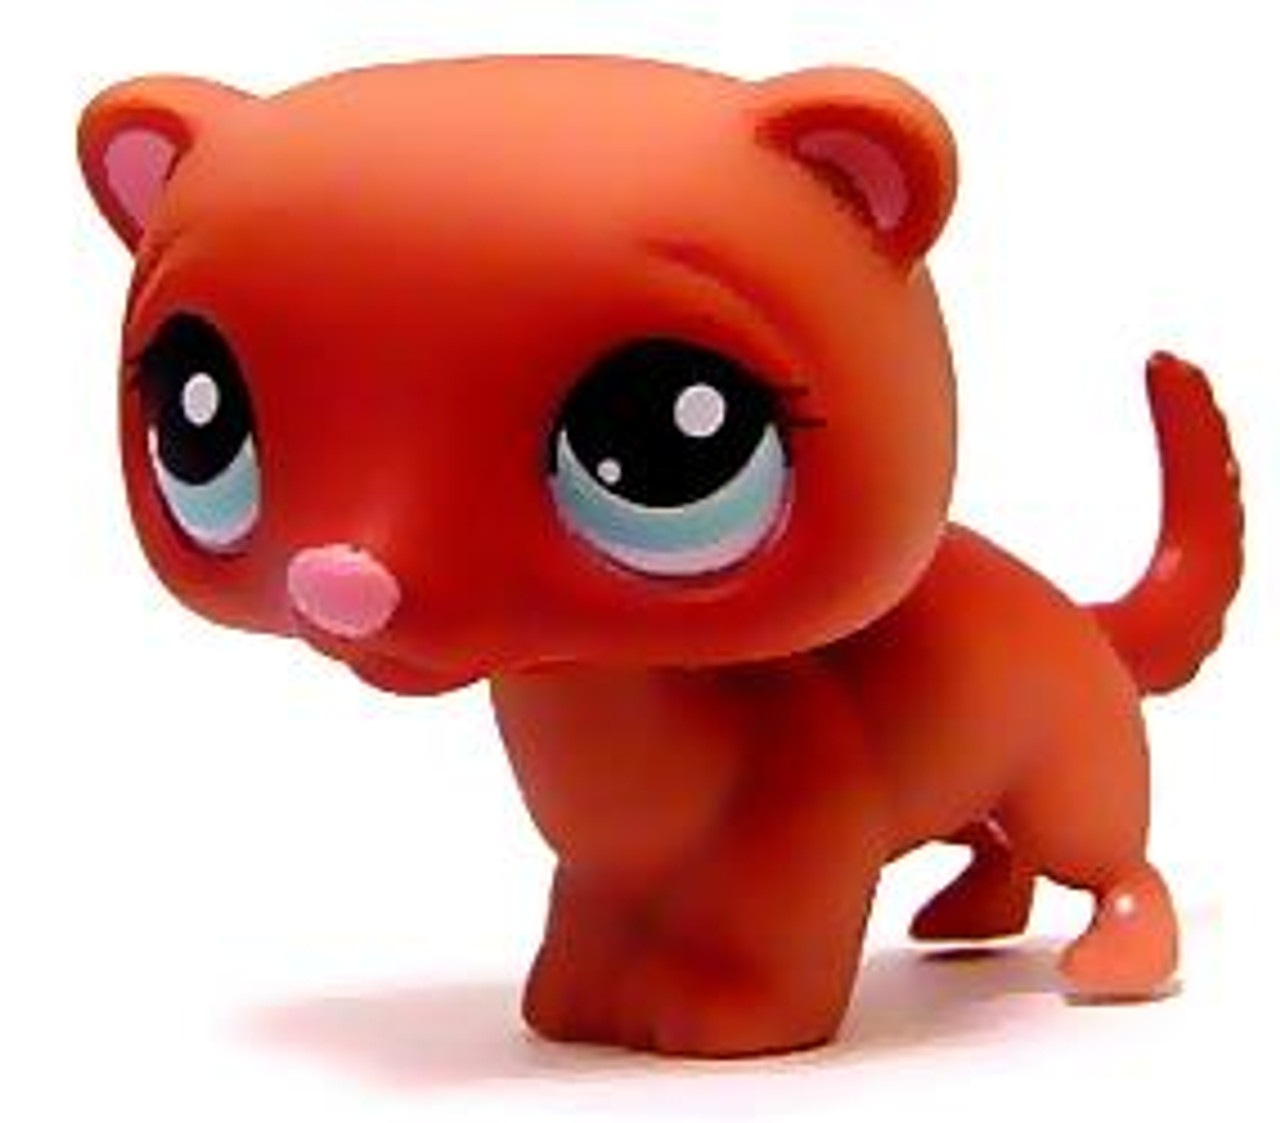 Littlest Pet Shop Ferret Figure #334 [Loose]